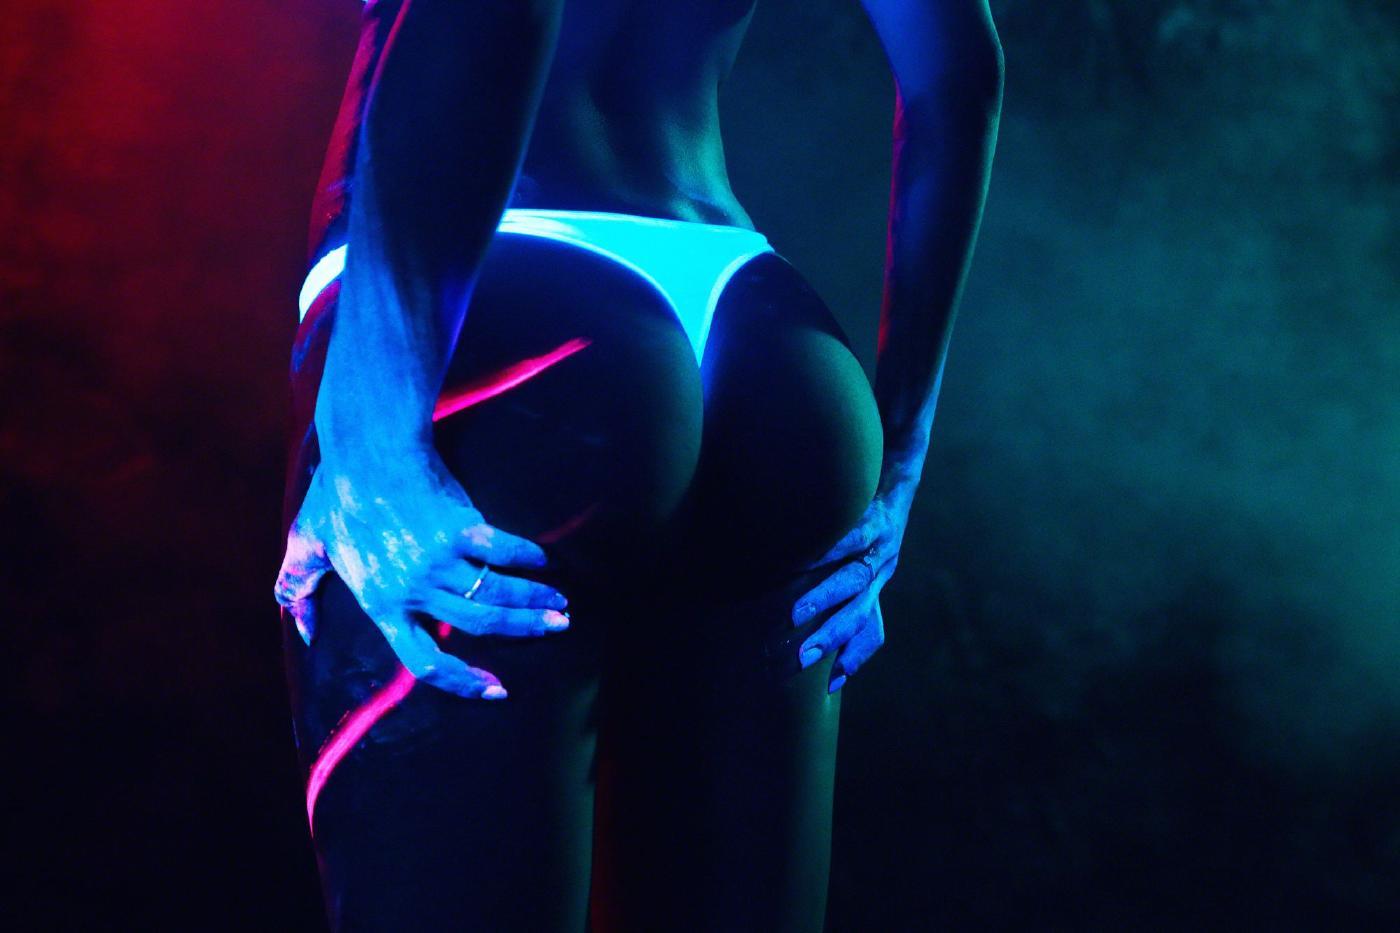 Kalinka Fox Nude Akali Cosplay Leaked 24